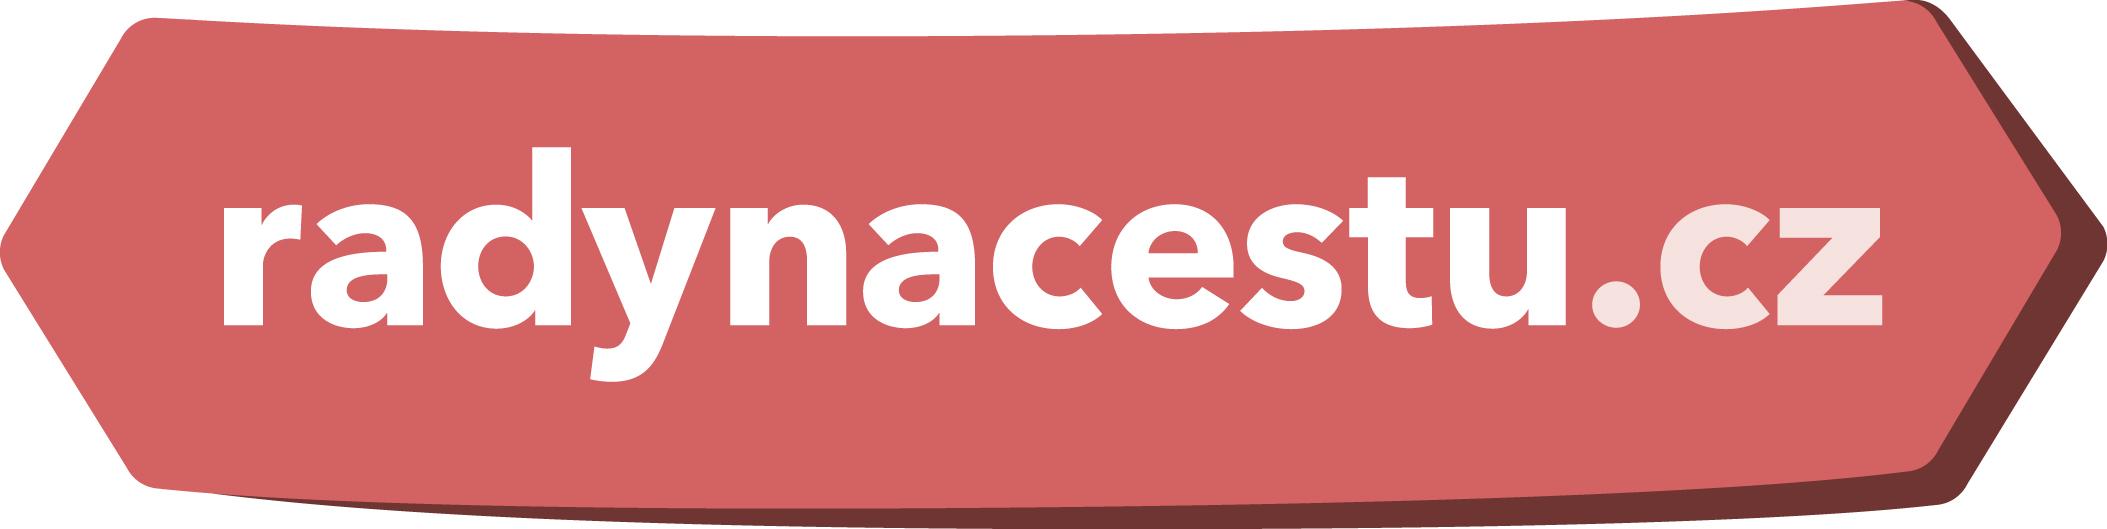 rnc-logo-color.jpg